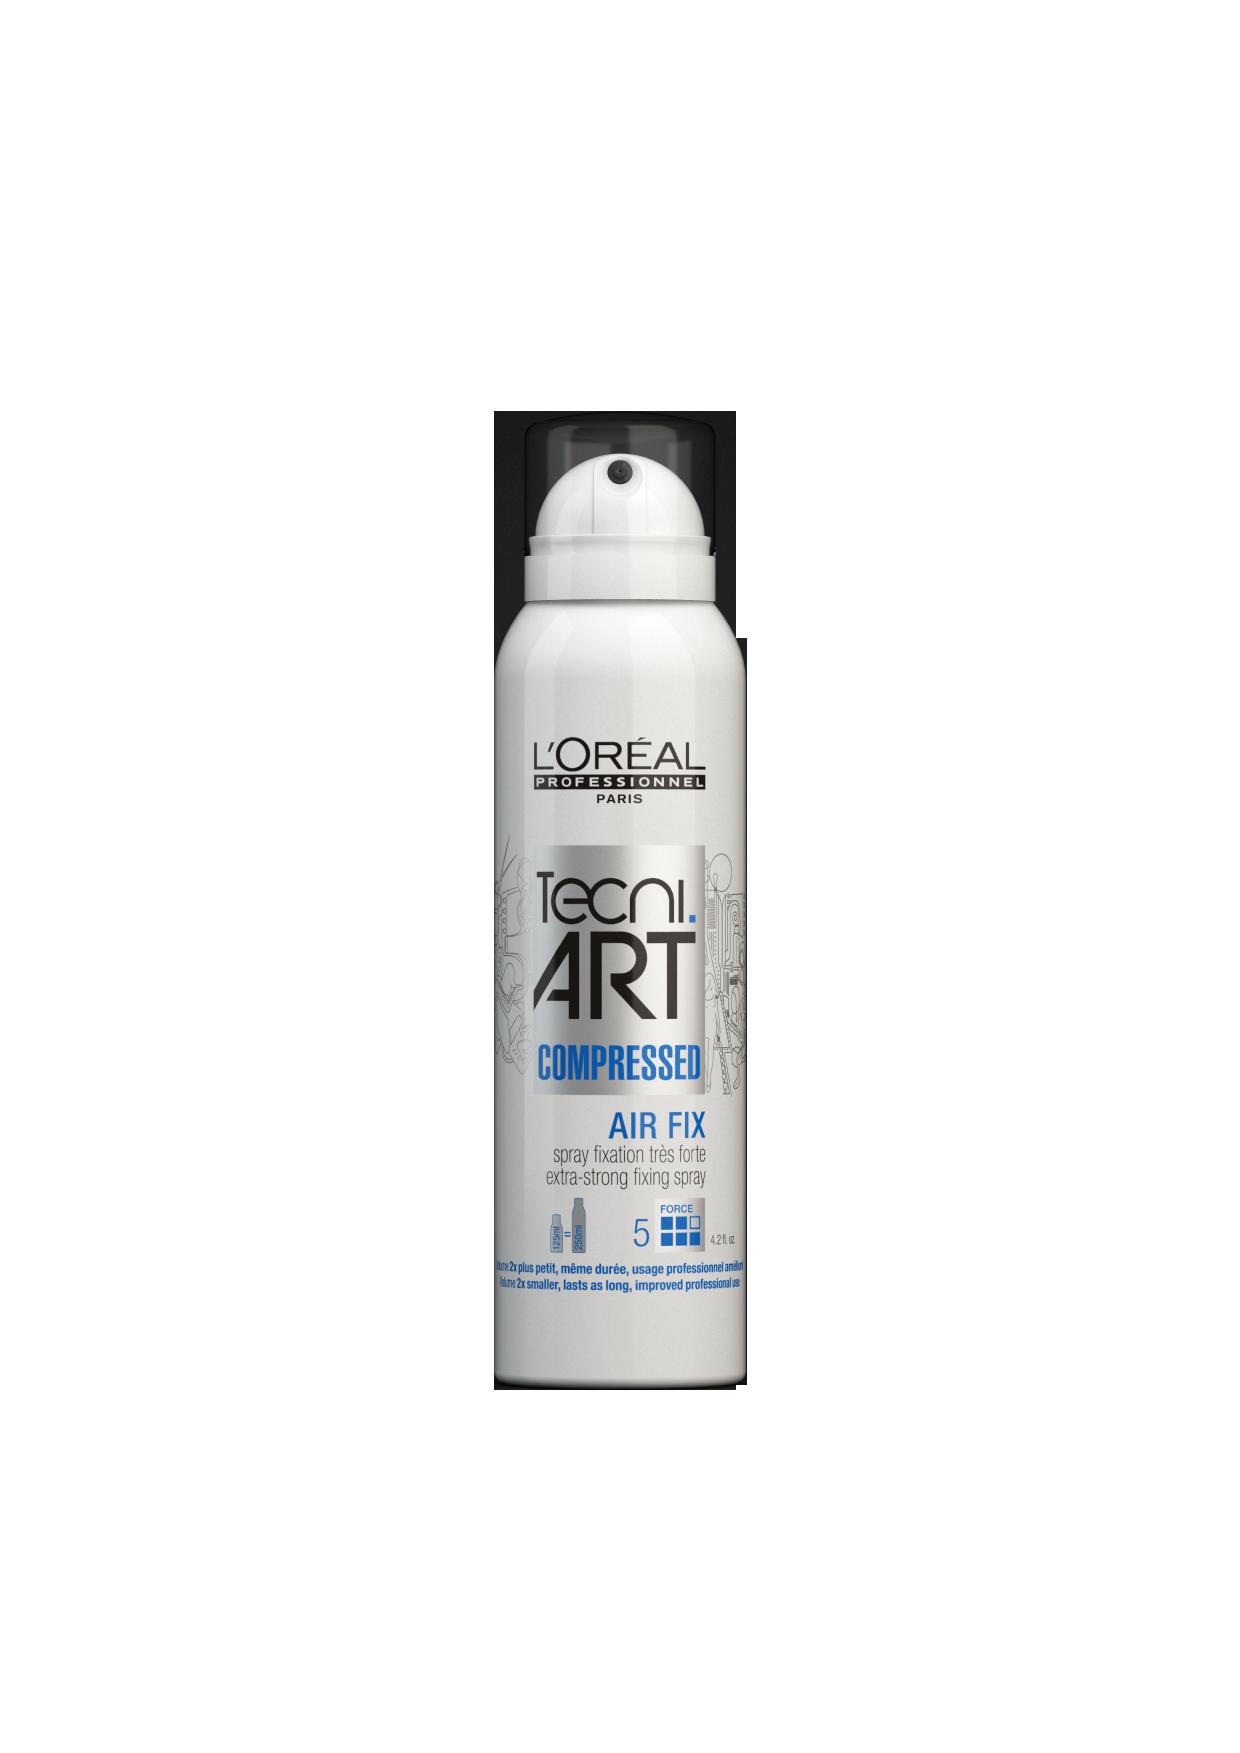 L'Or+®al Professionnel Tecni.Art _ Air FIx Compressed